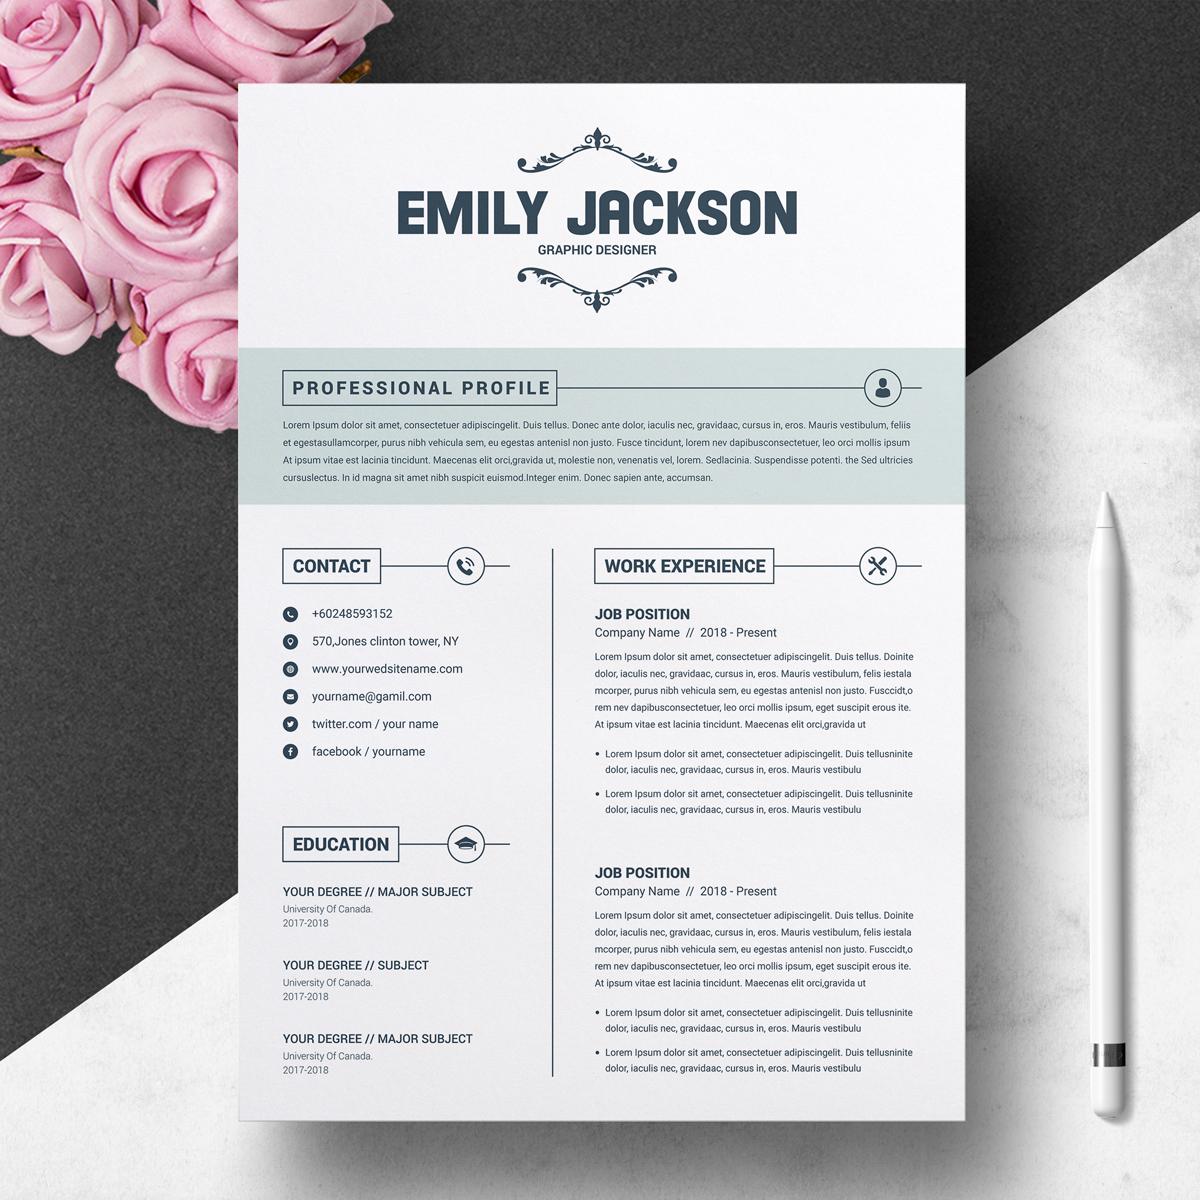 emily jackson resume template  74376